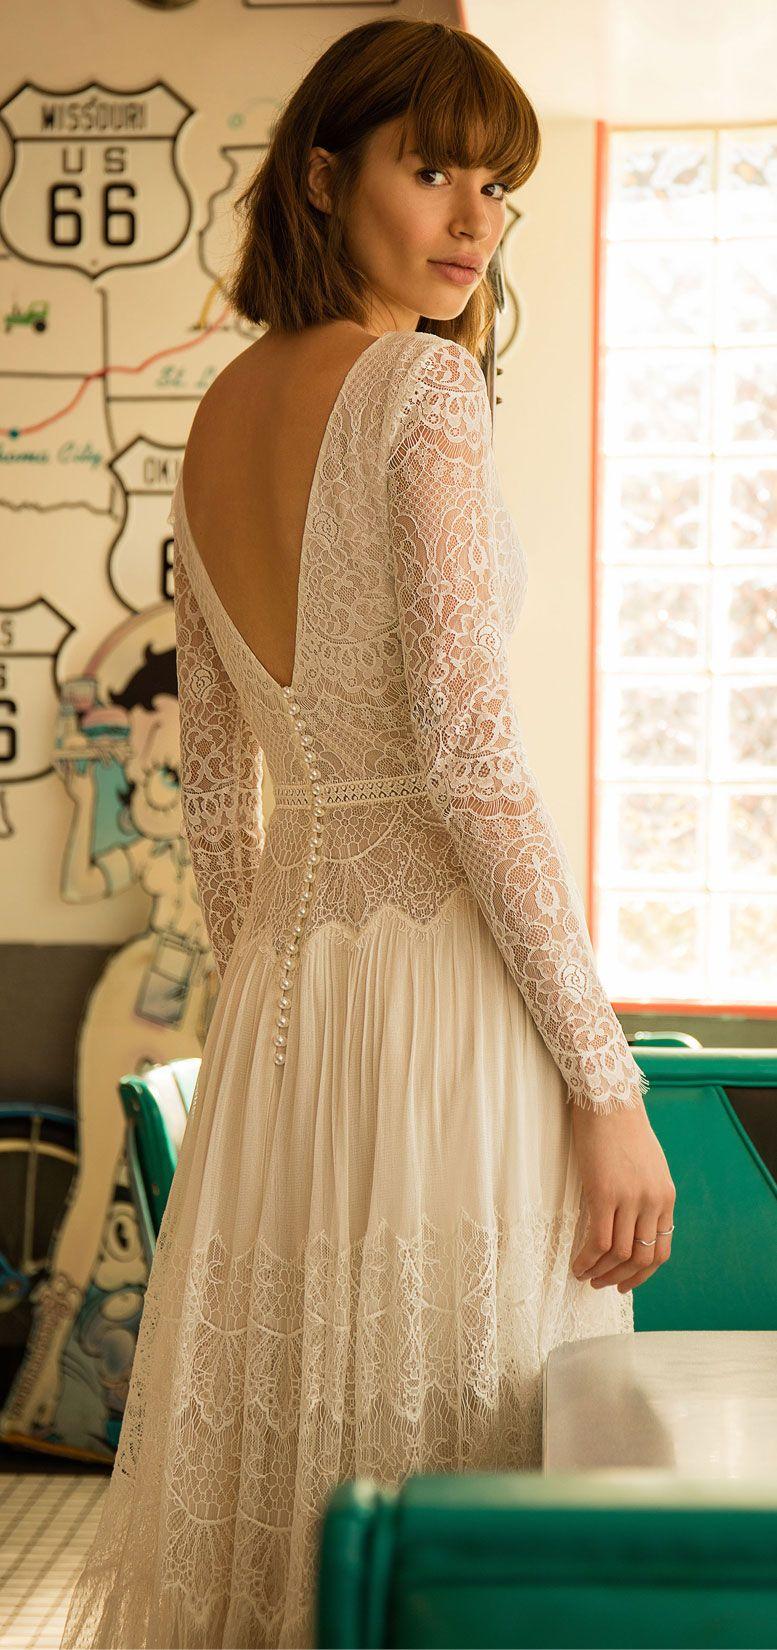 Flora Bride - Siren Of The Desert 2019 Bridal Collection, boho wedding dress, bohemian wedding gown ,a-line wedding dress,long sleeves wedding gown #wedding #weddingdress #weddinggown #bridedress